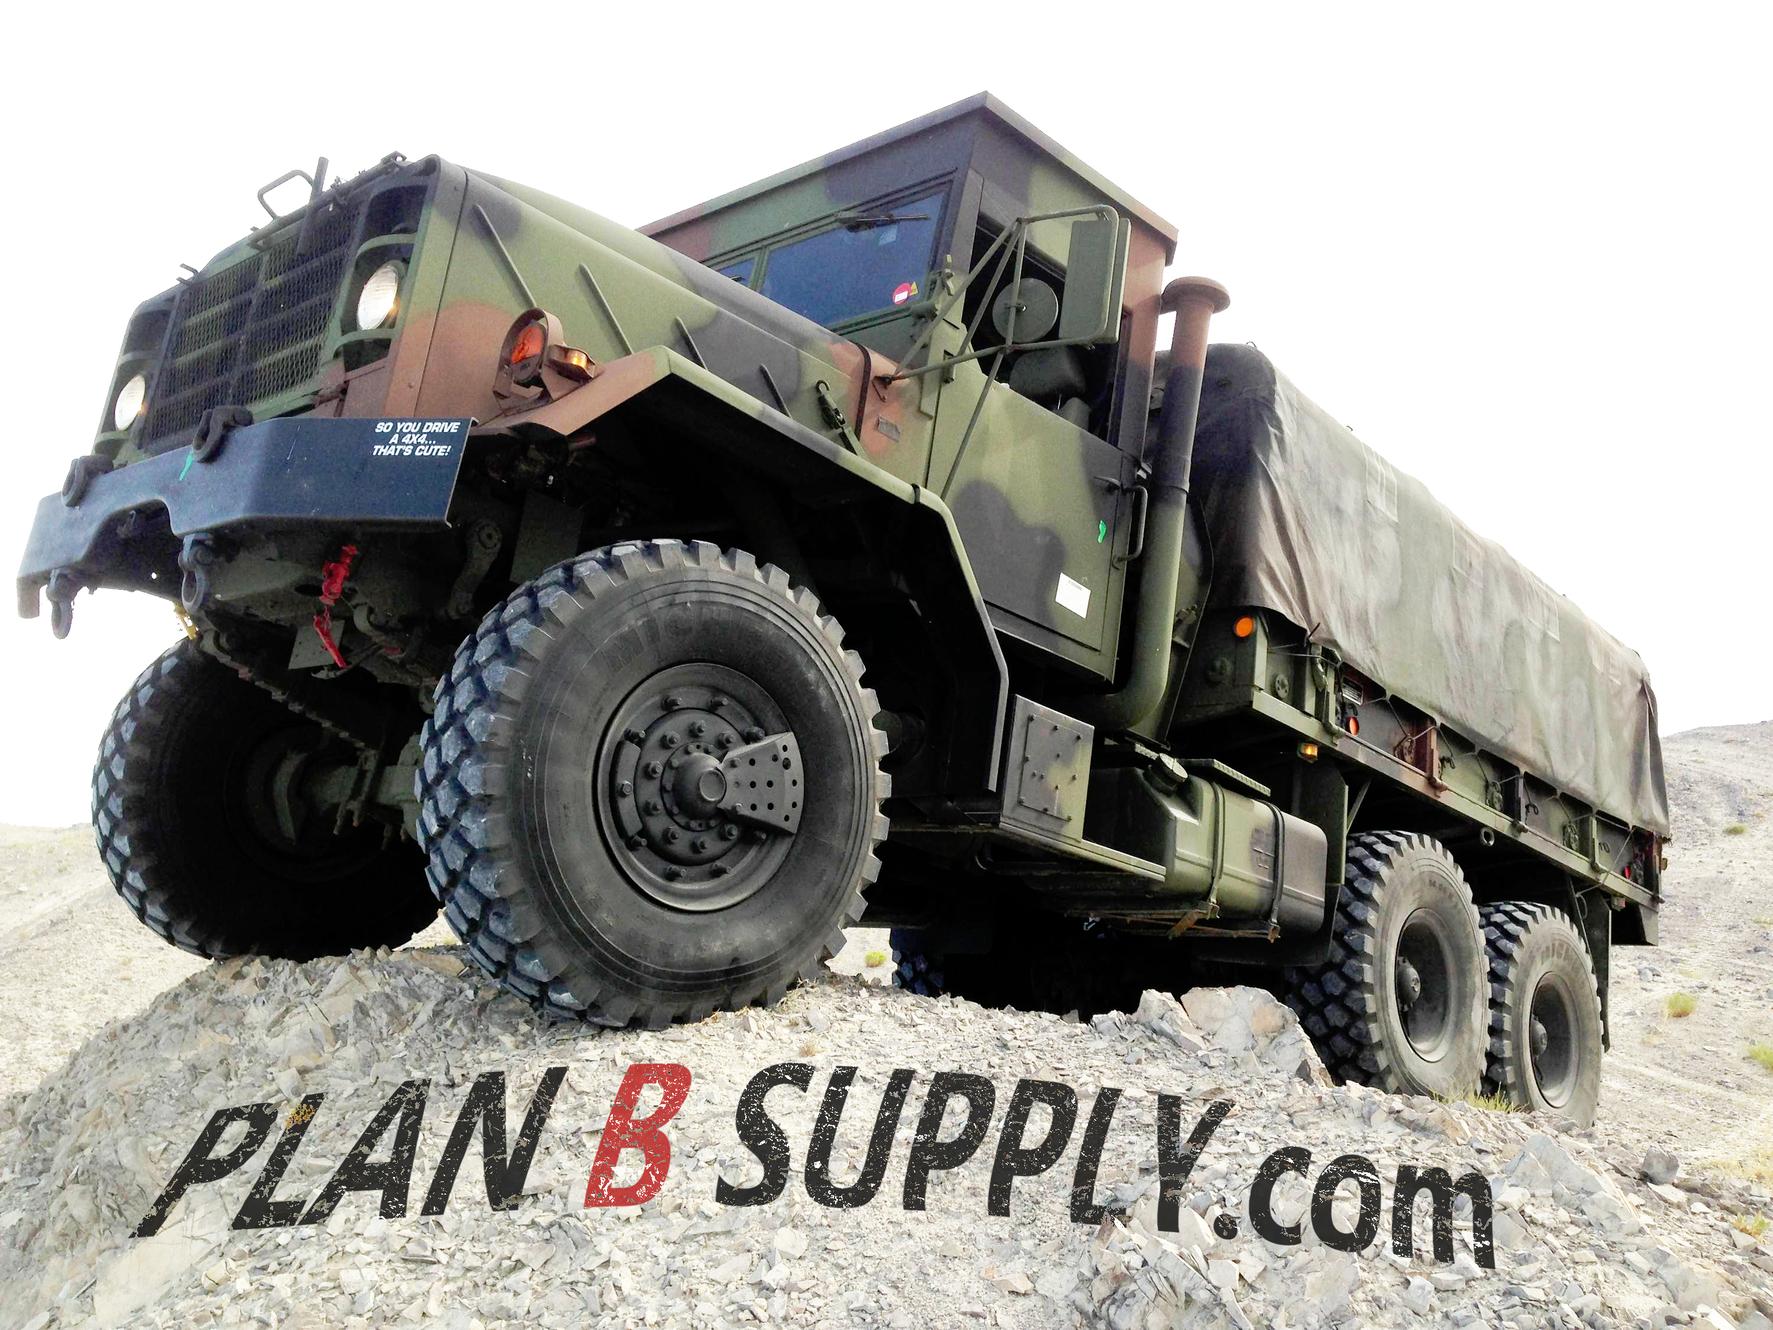 Military Hummer For Sale Humvee Hmmwv H1 Utah Mrap Aluminum 24 Volt Convoy Armored Vehicles Bobbed Duece And A Military Vehicles For Sale 6x6 Truck Army Truck